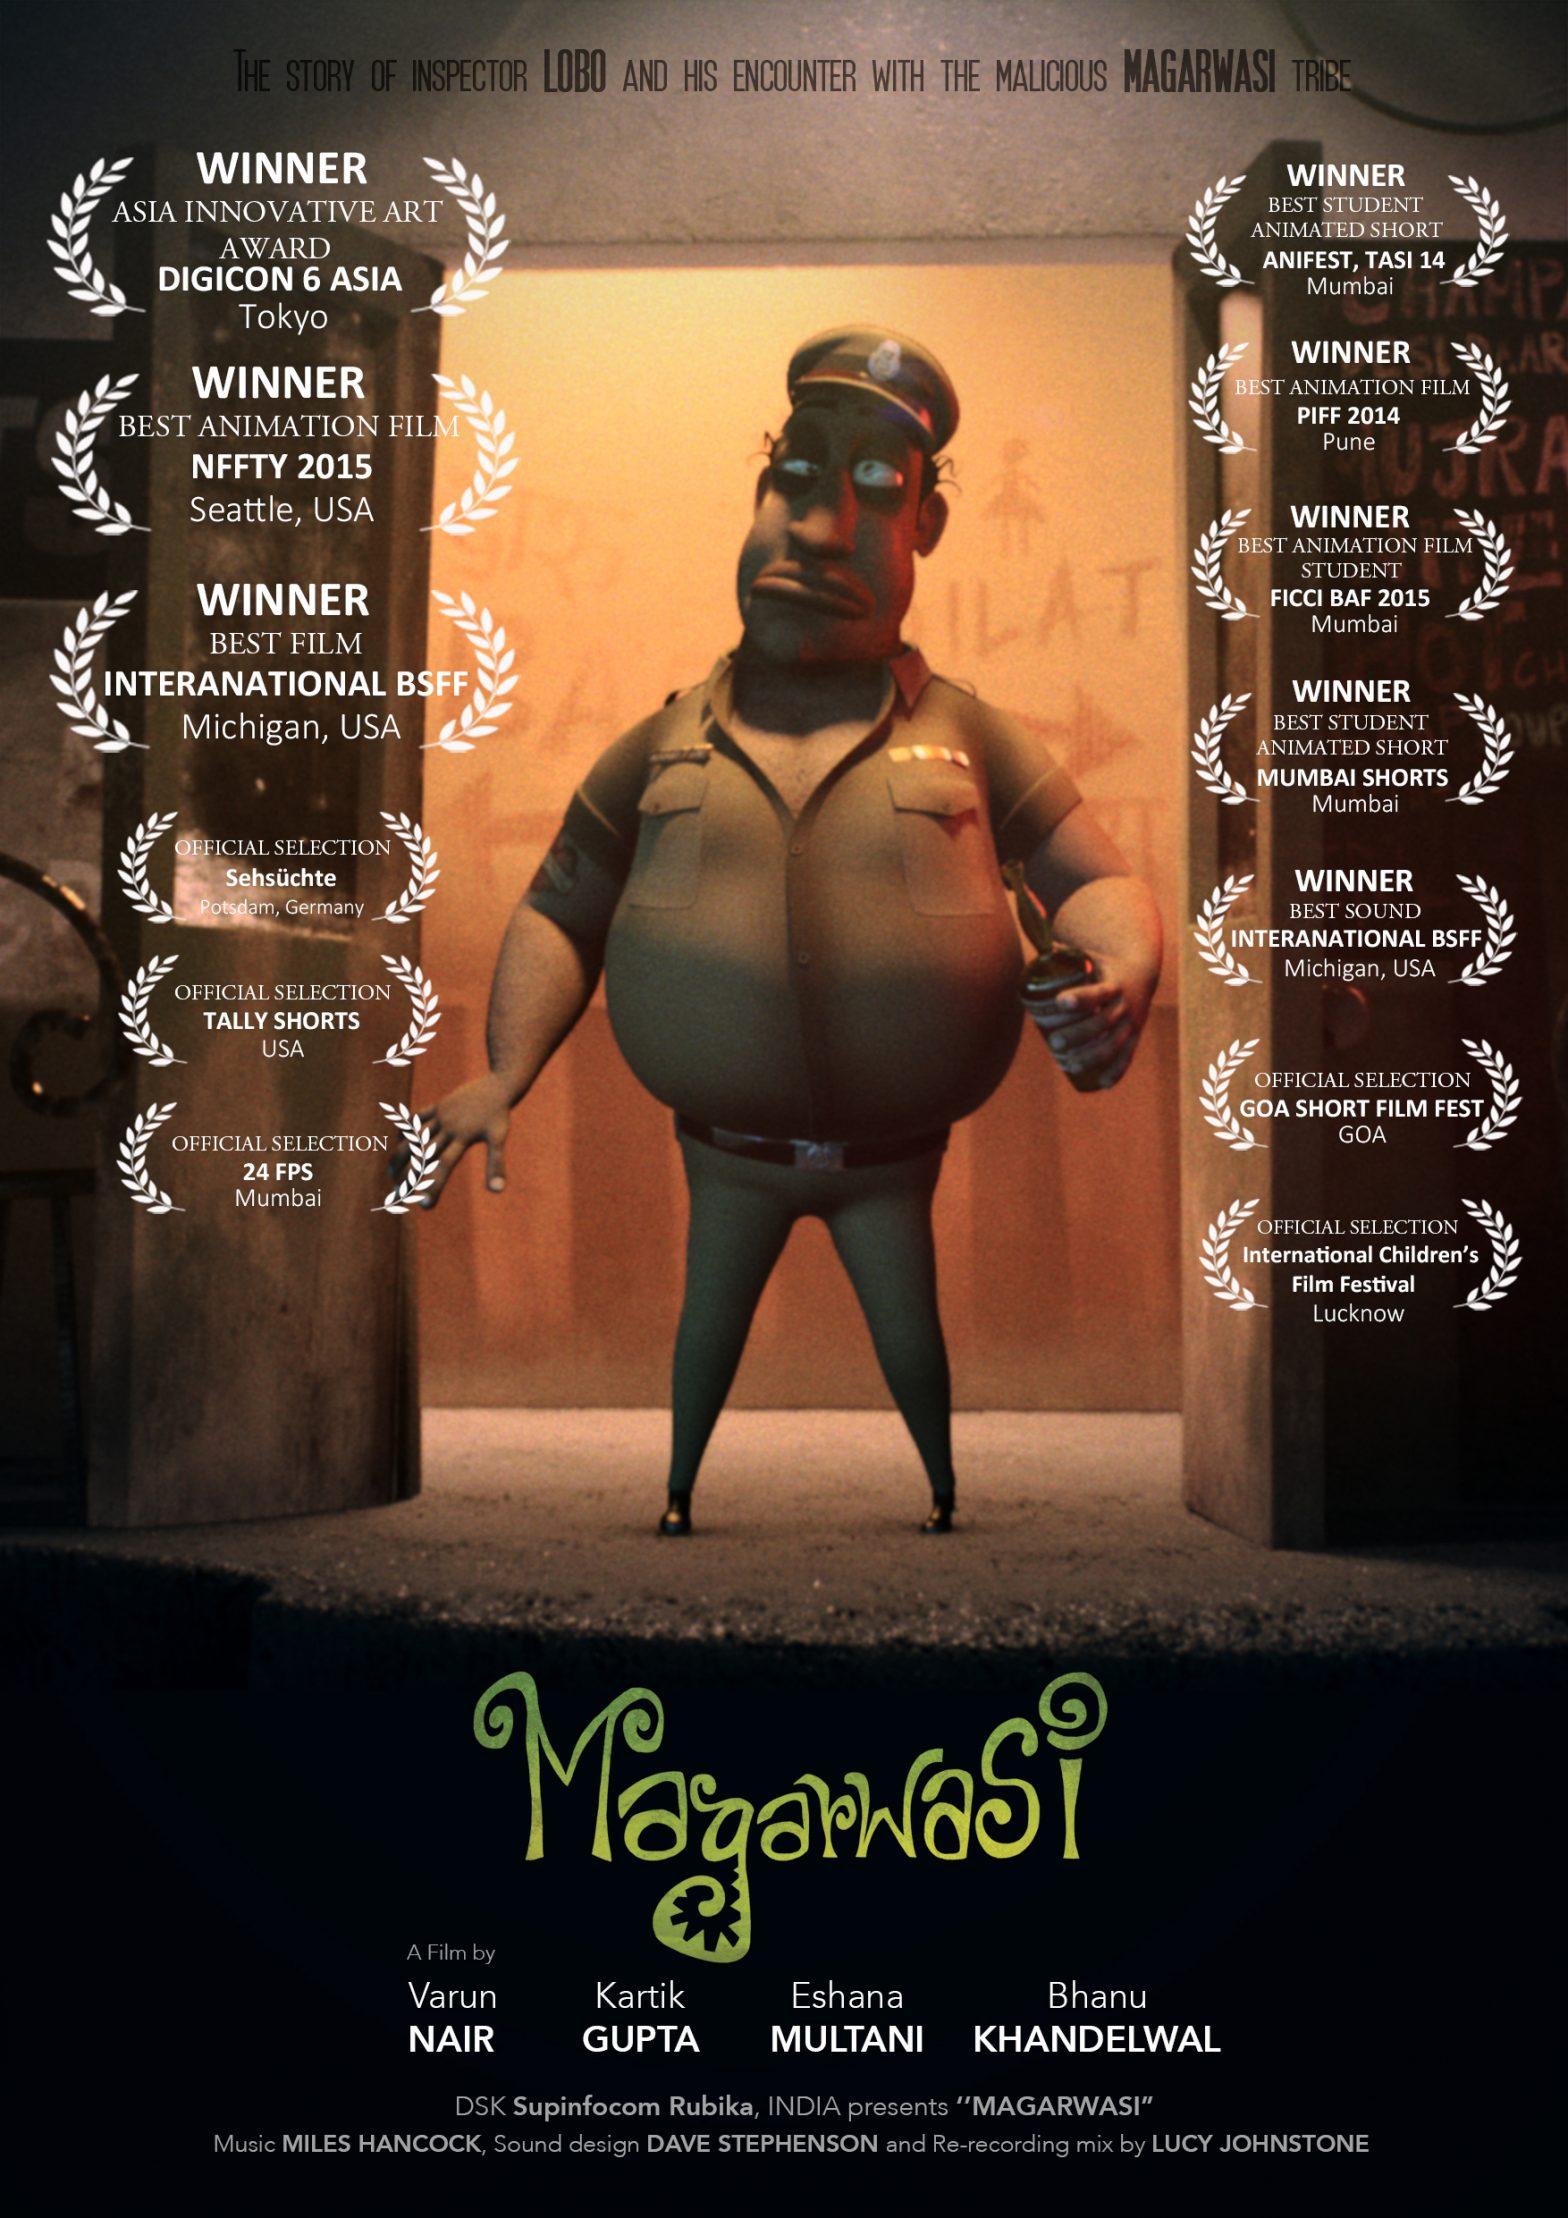 Magarwasi